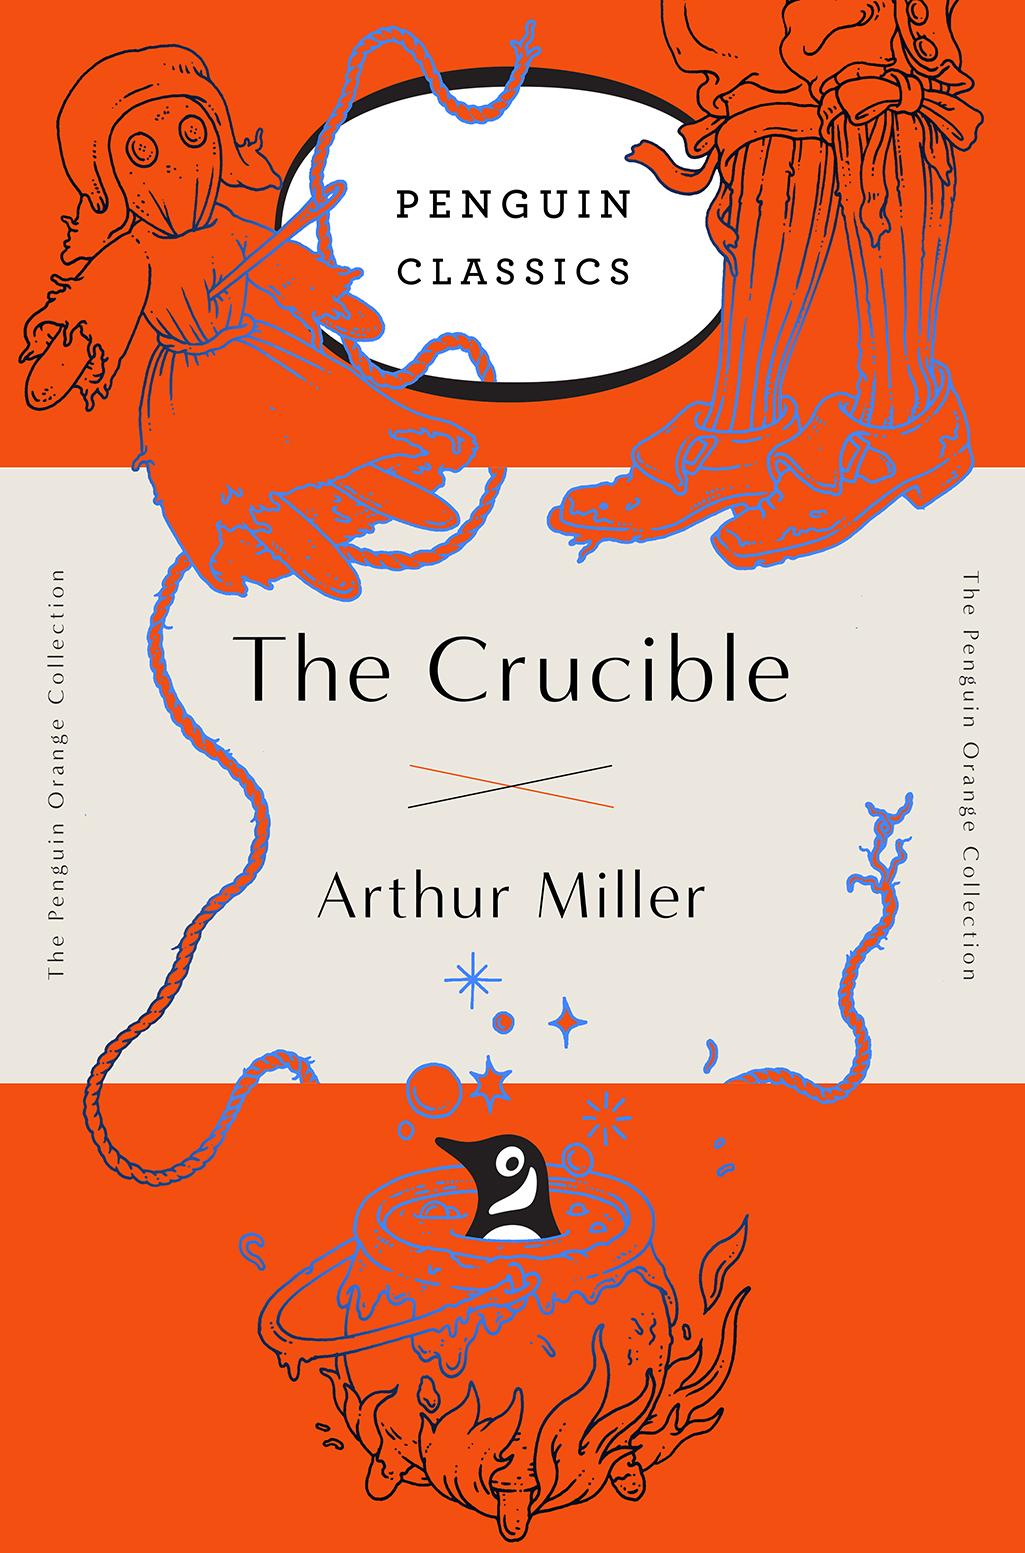 TheCruciblecweb.jpg